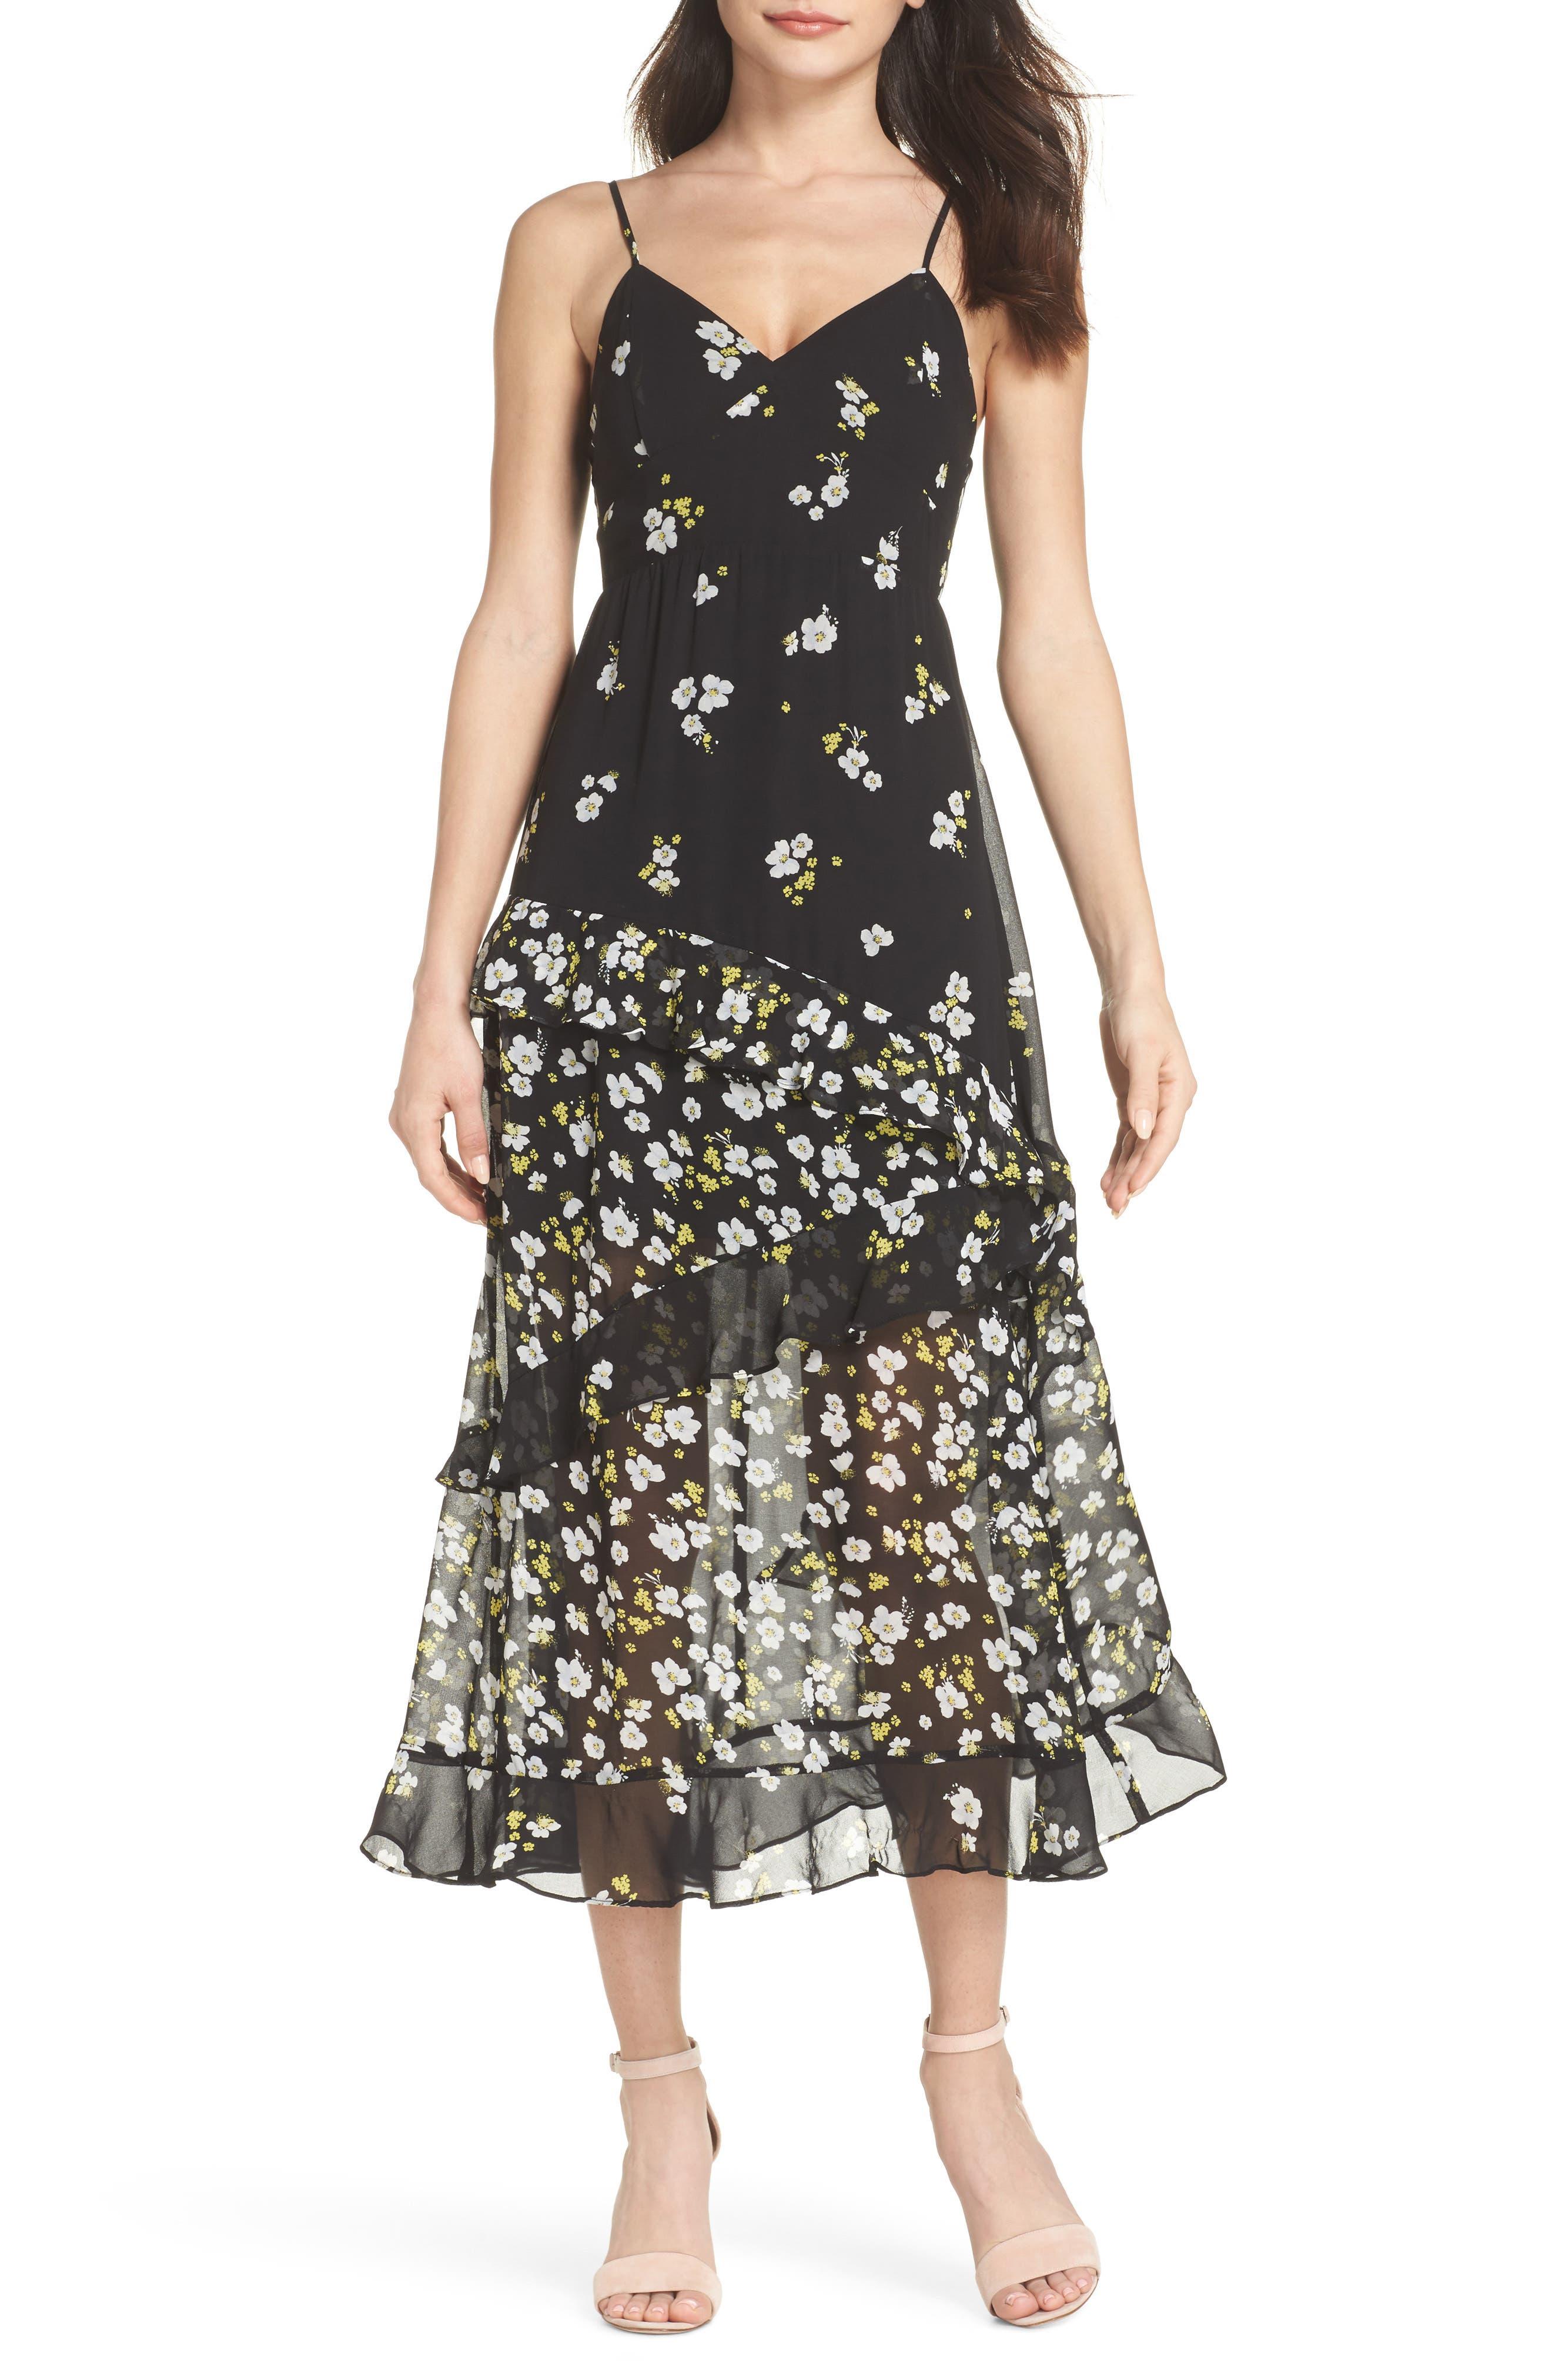 Ditzy Floral & Ruffle Chiffon Dress,                             Main thumbnail 1, color,                             001